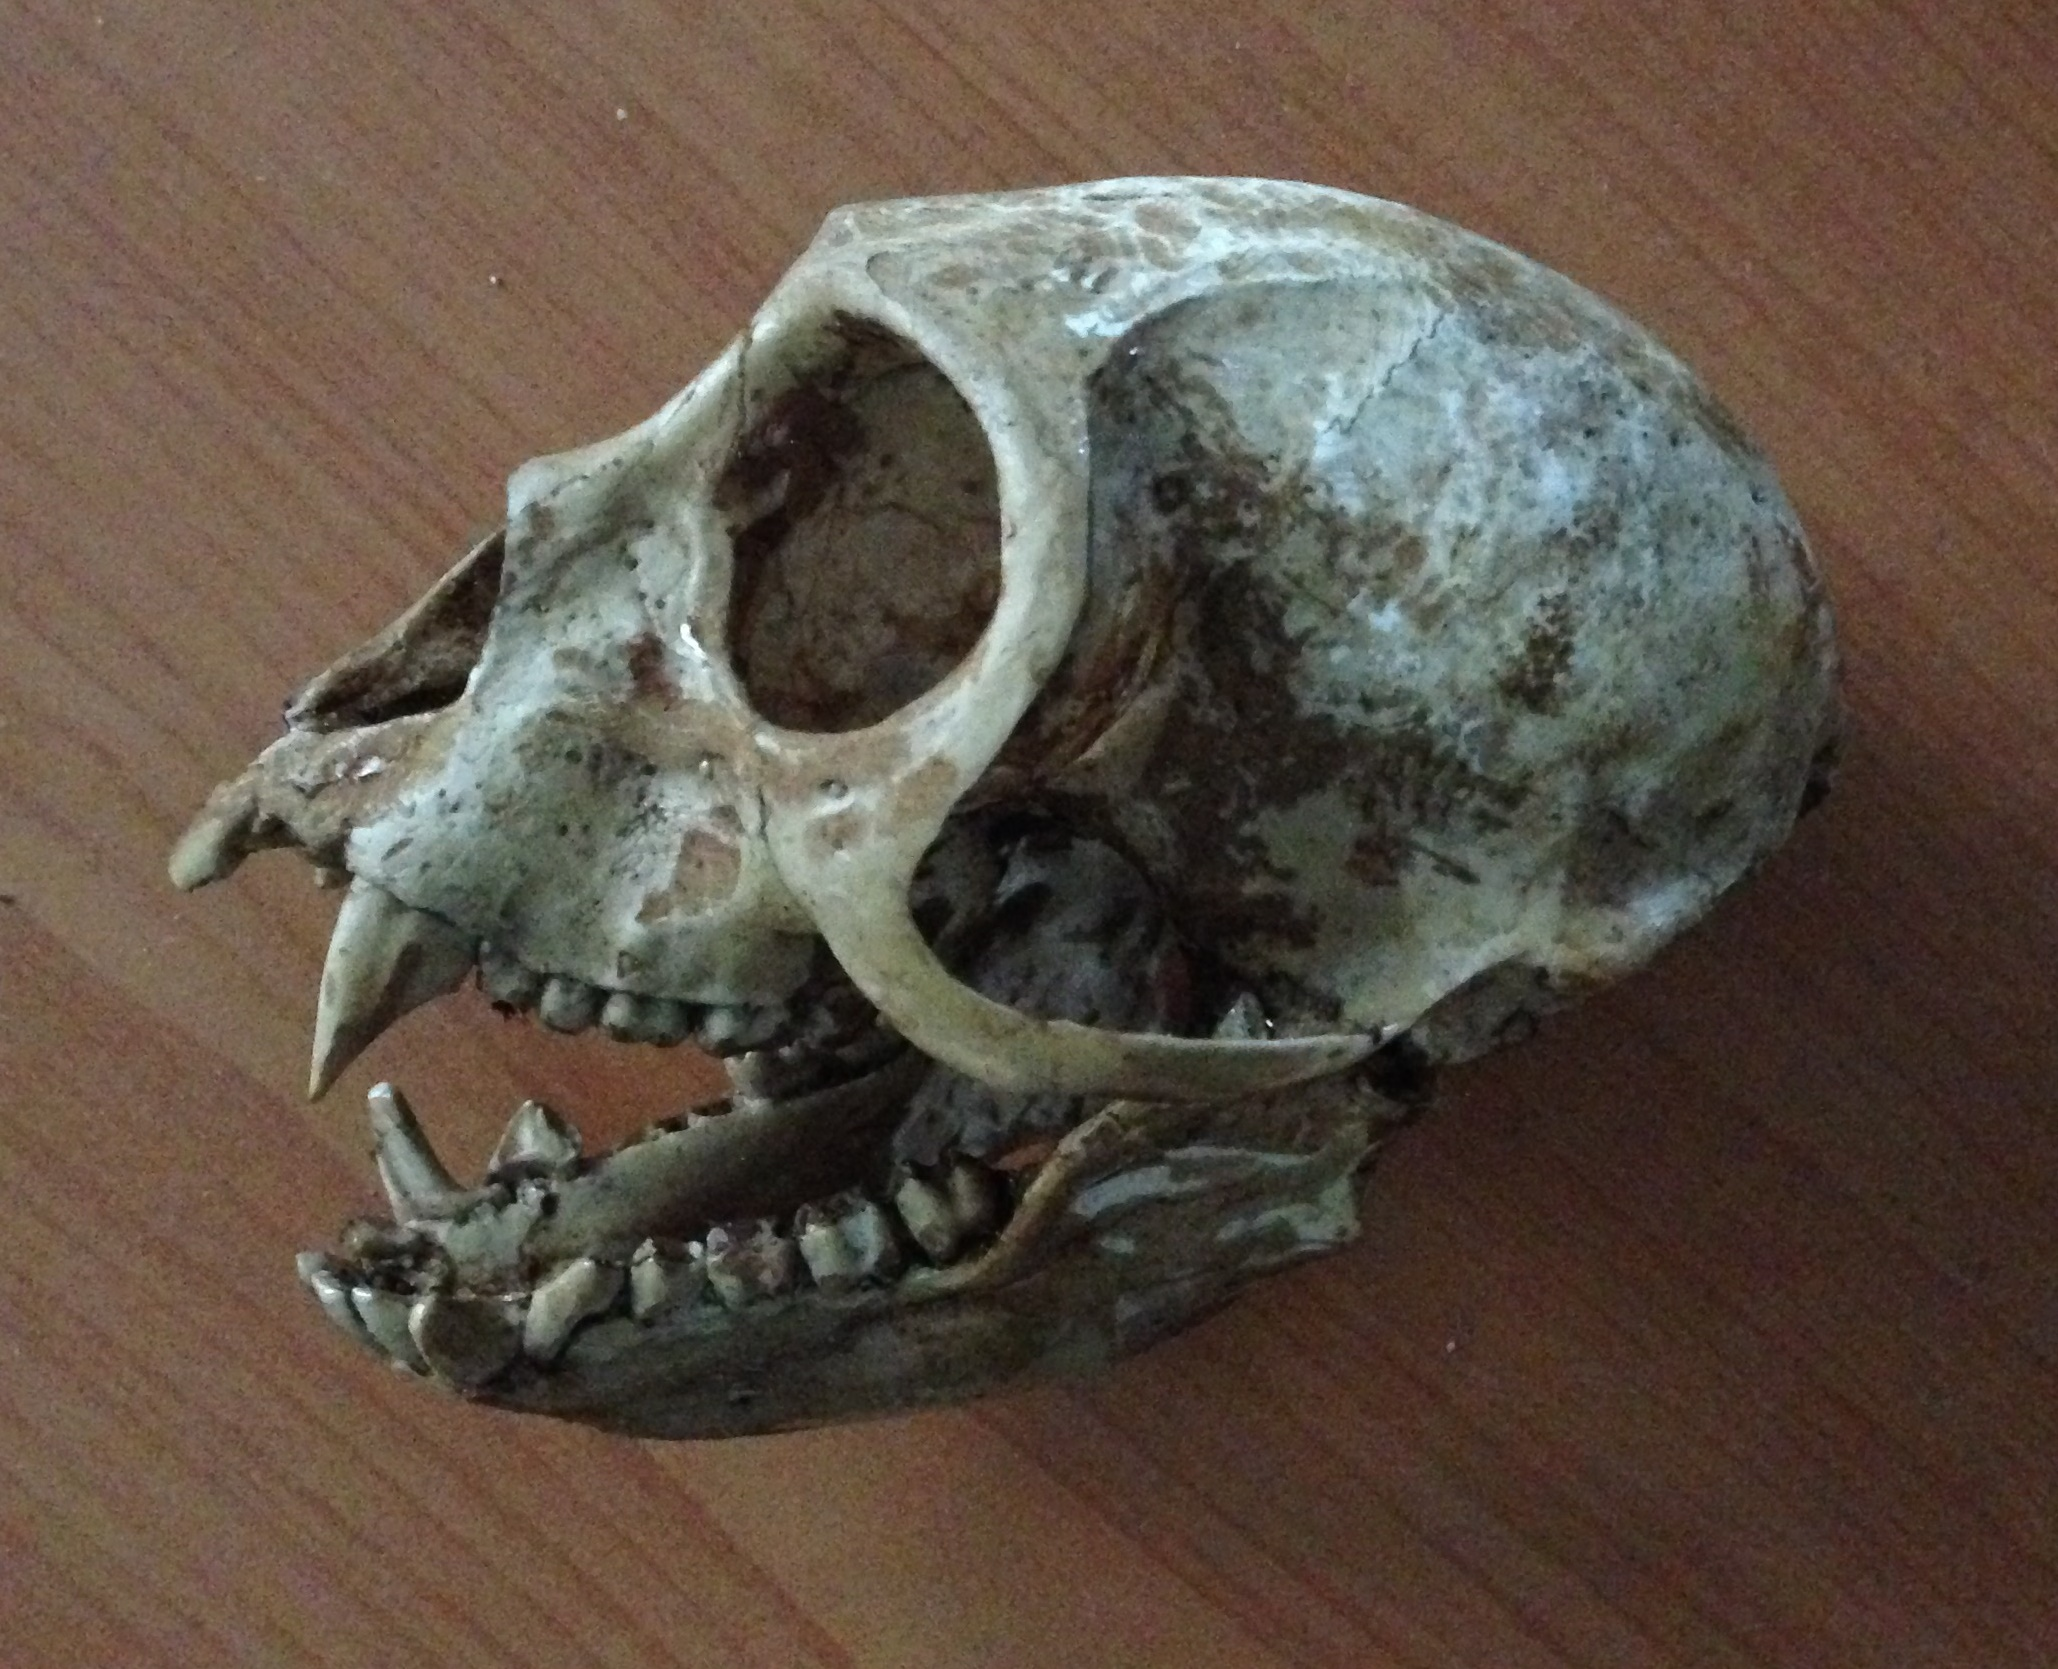 Replica monkey skull